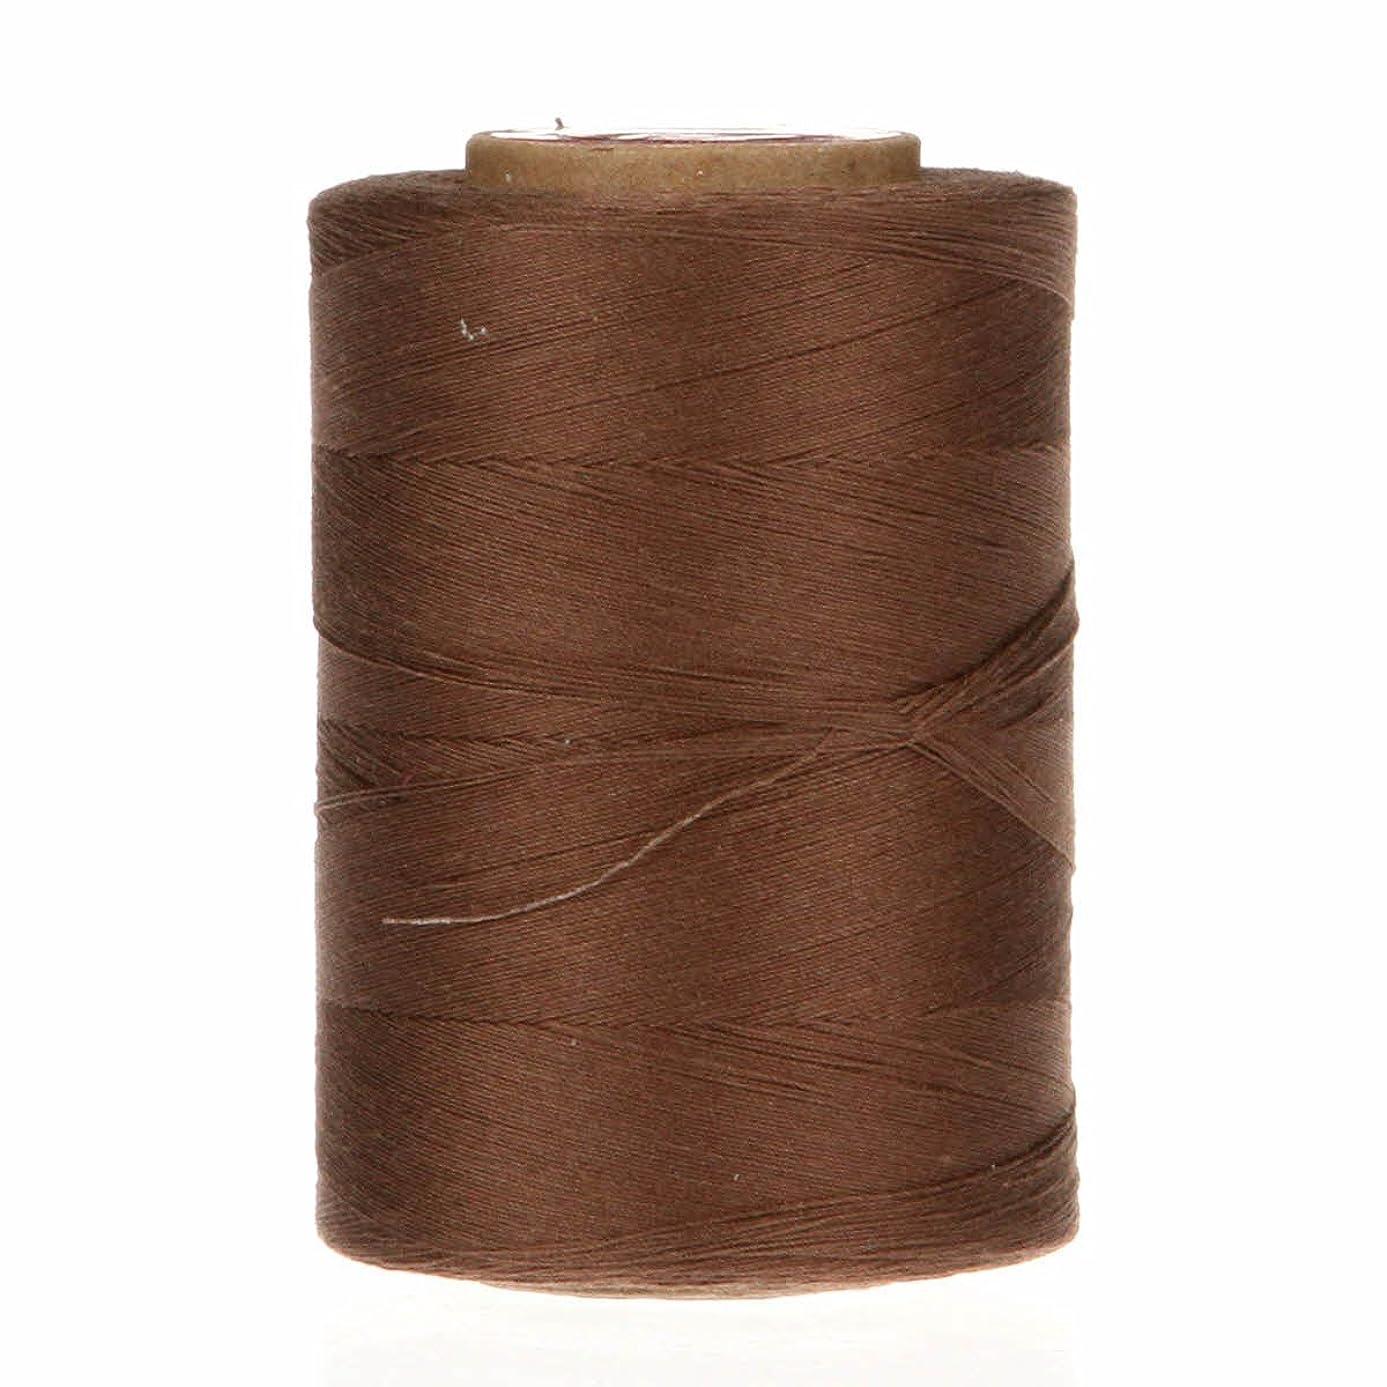 YLI Star Thread V37-8380 3-Ply T-35 Cotton Quilting & Craft Thread, 1200 yd, Seal Brown